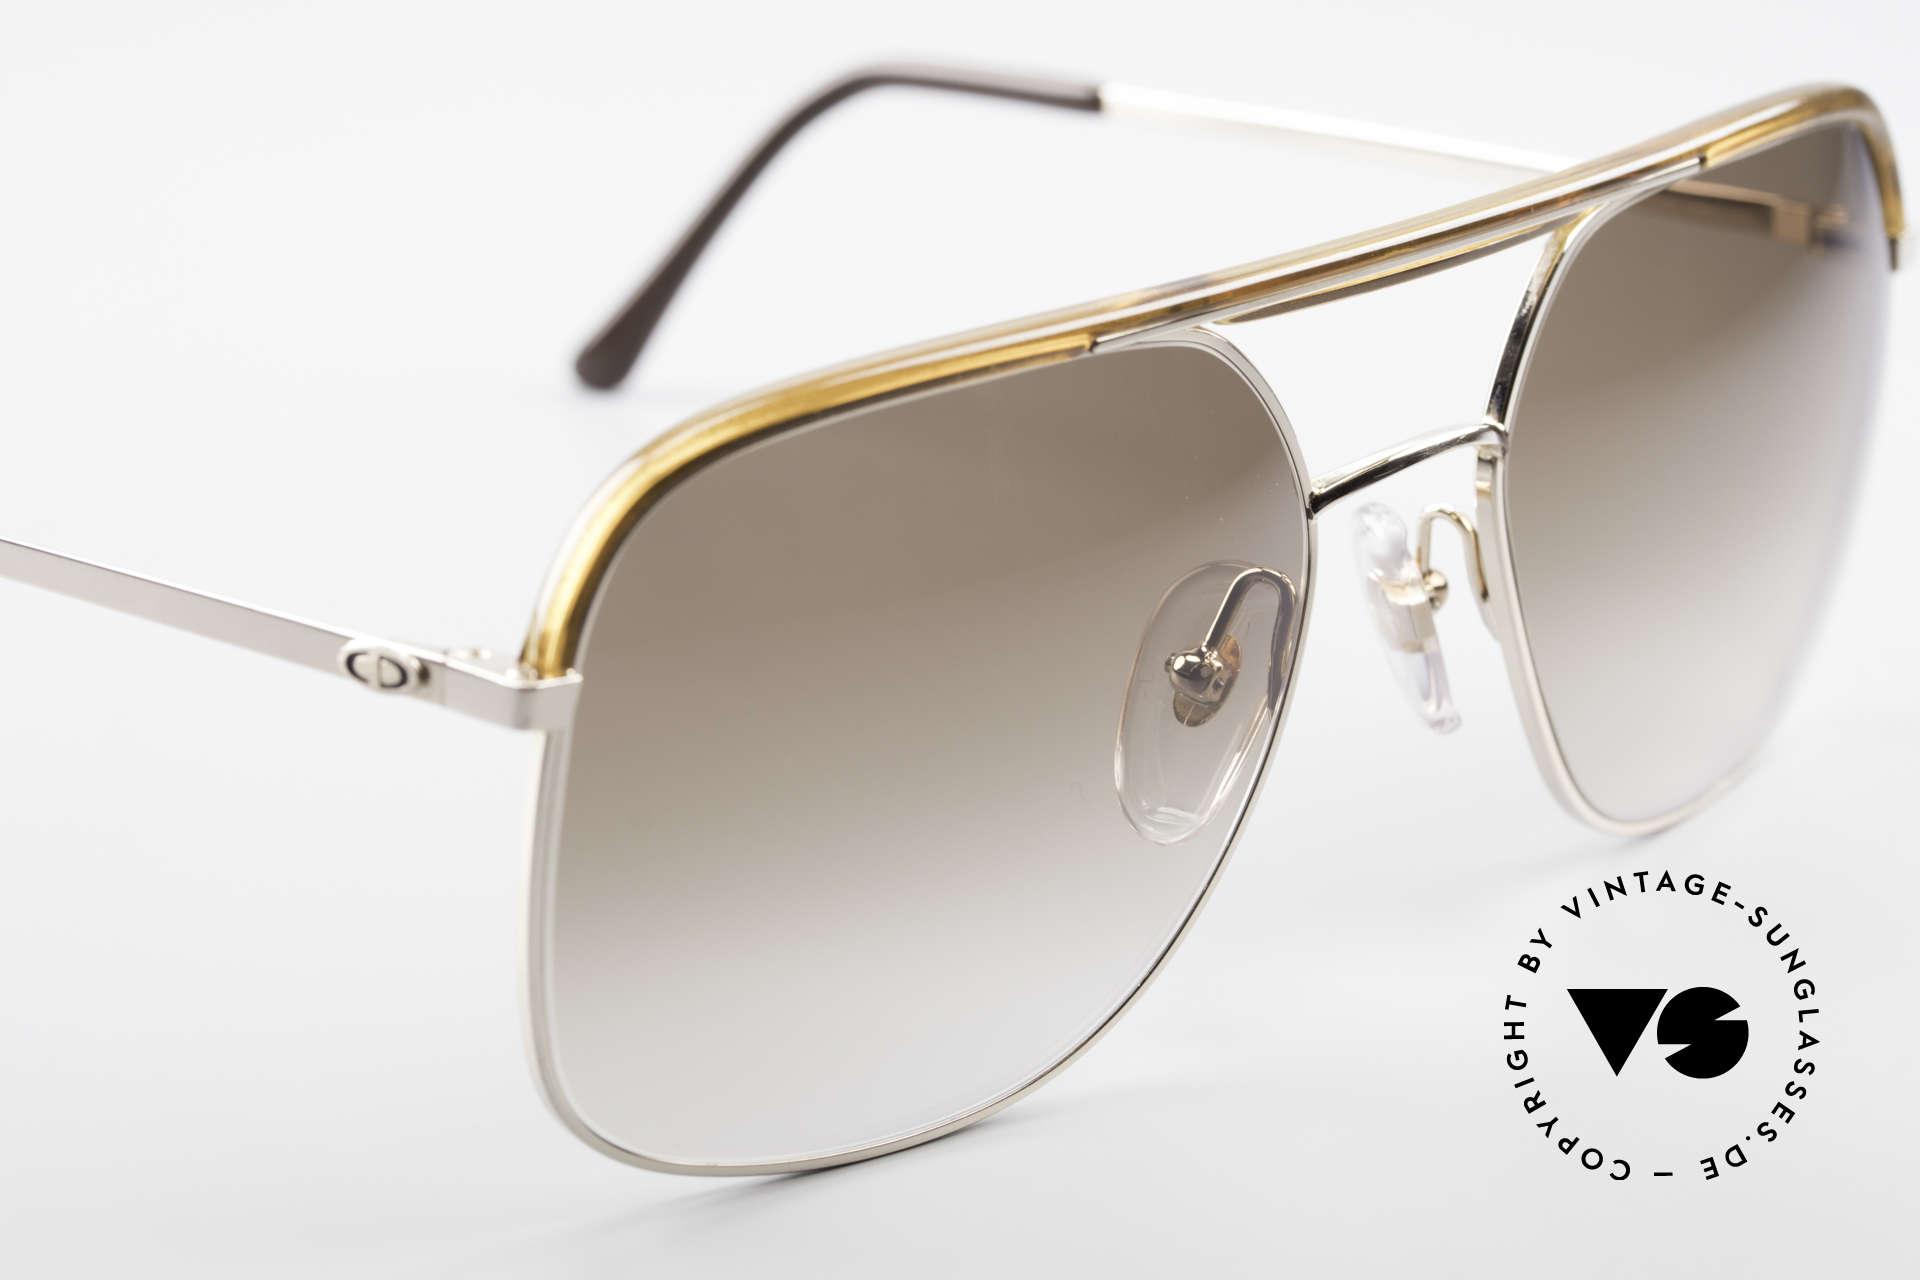 Christian Dior 2247 80's Men's Shades Vintage, new old stock (like all our rare old designer eyeglasses), Made for Men